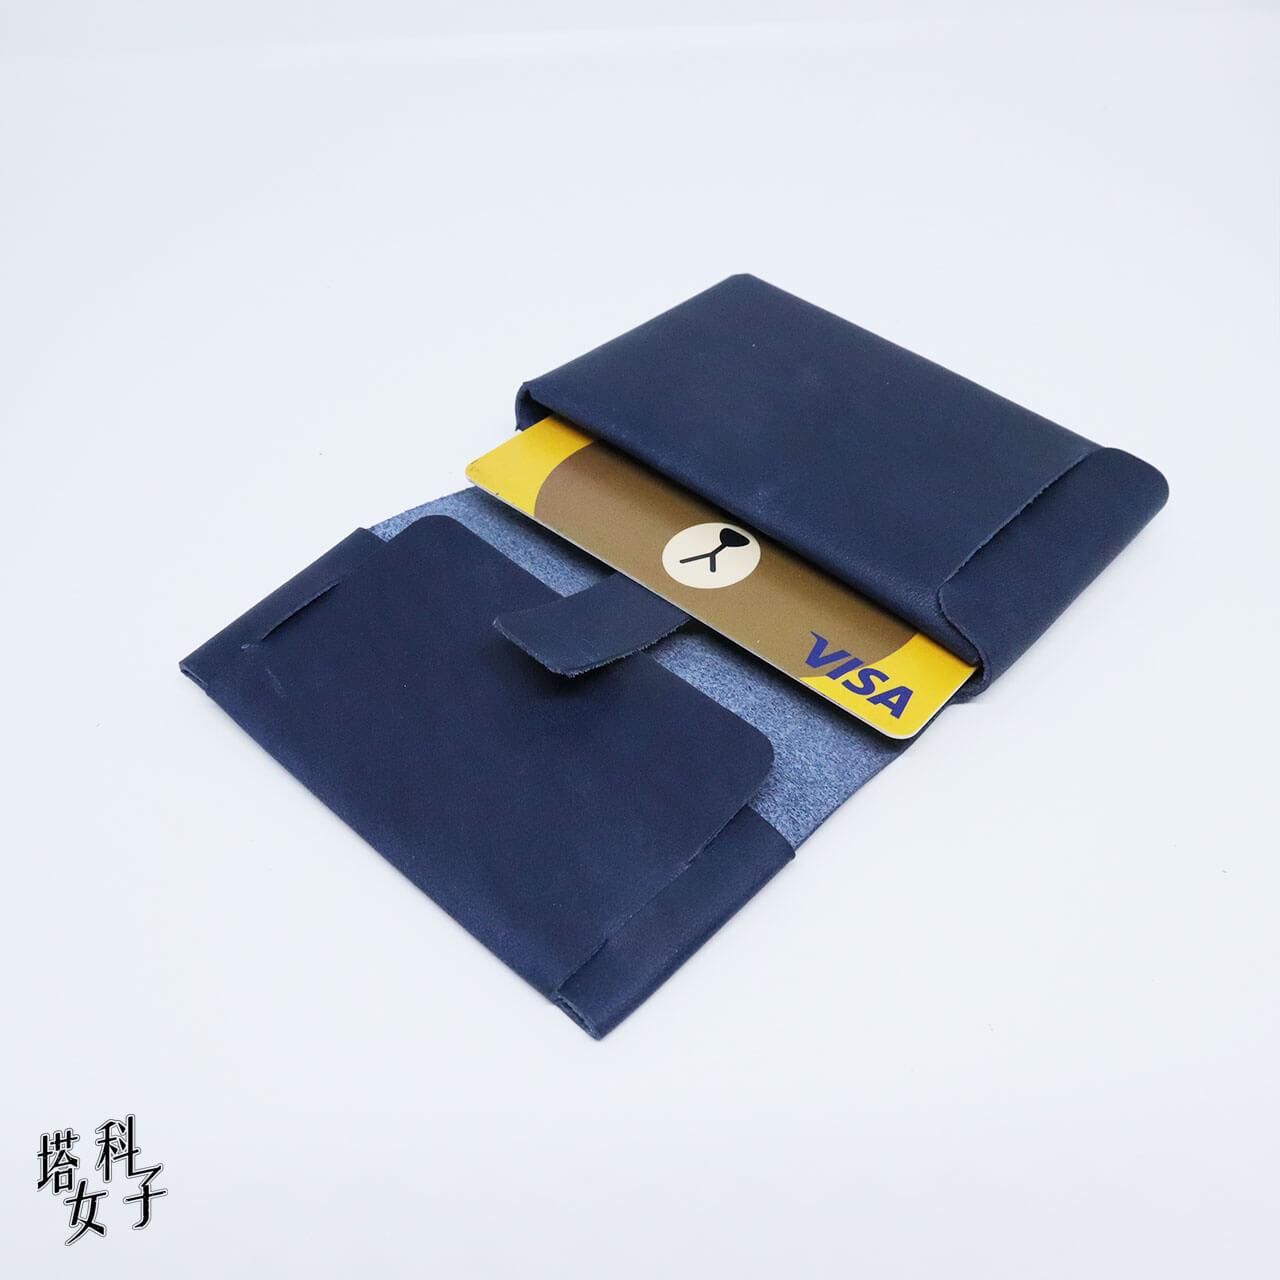 0.7 Wallet 雙面感應卡夾 防盜收納層